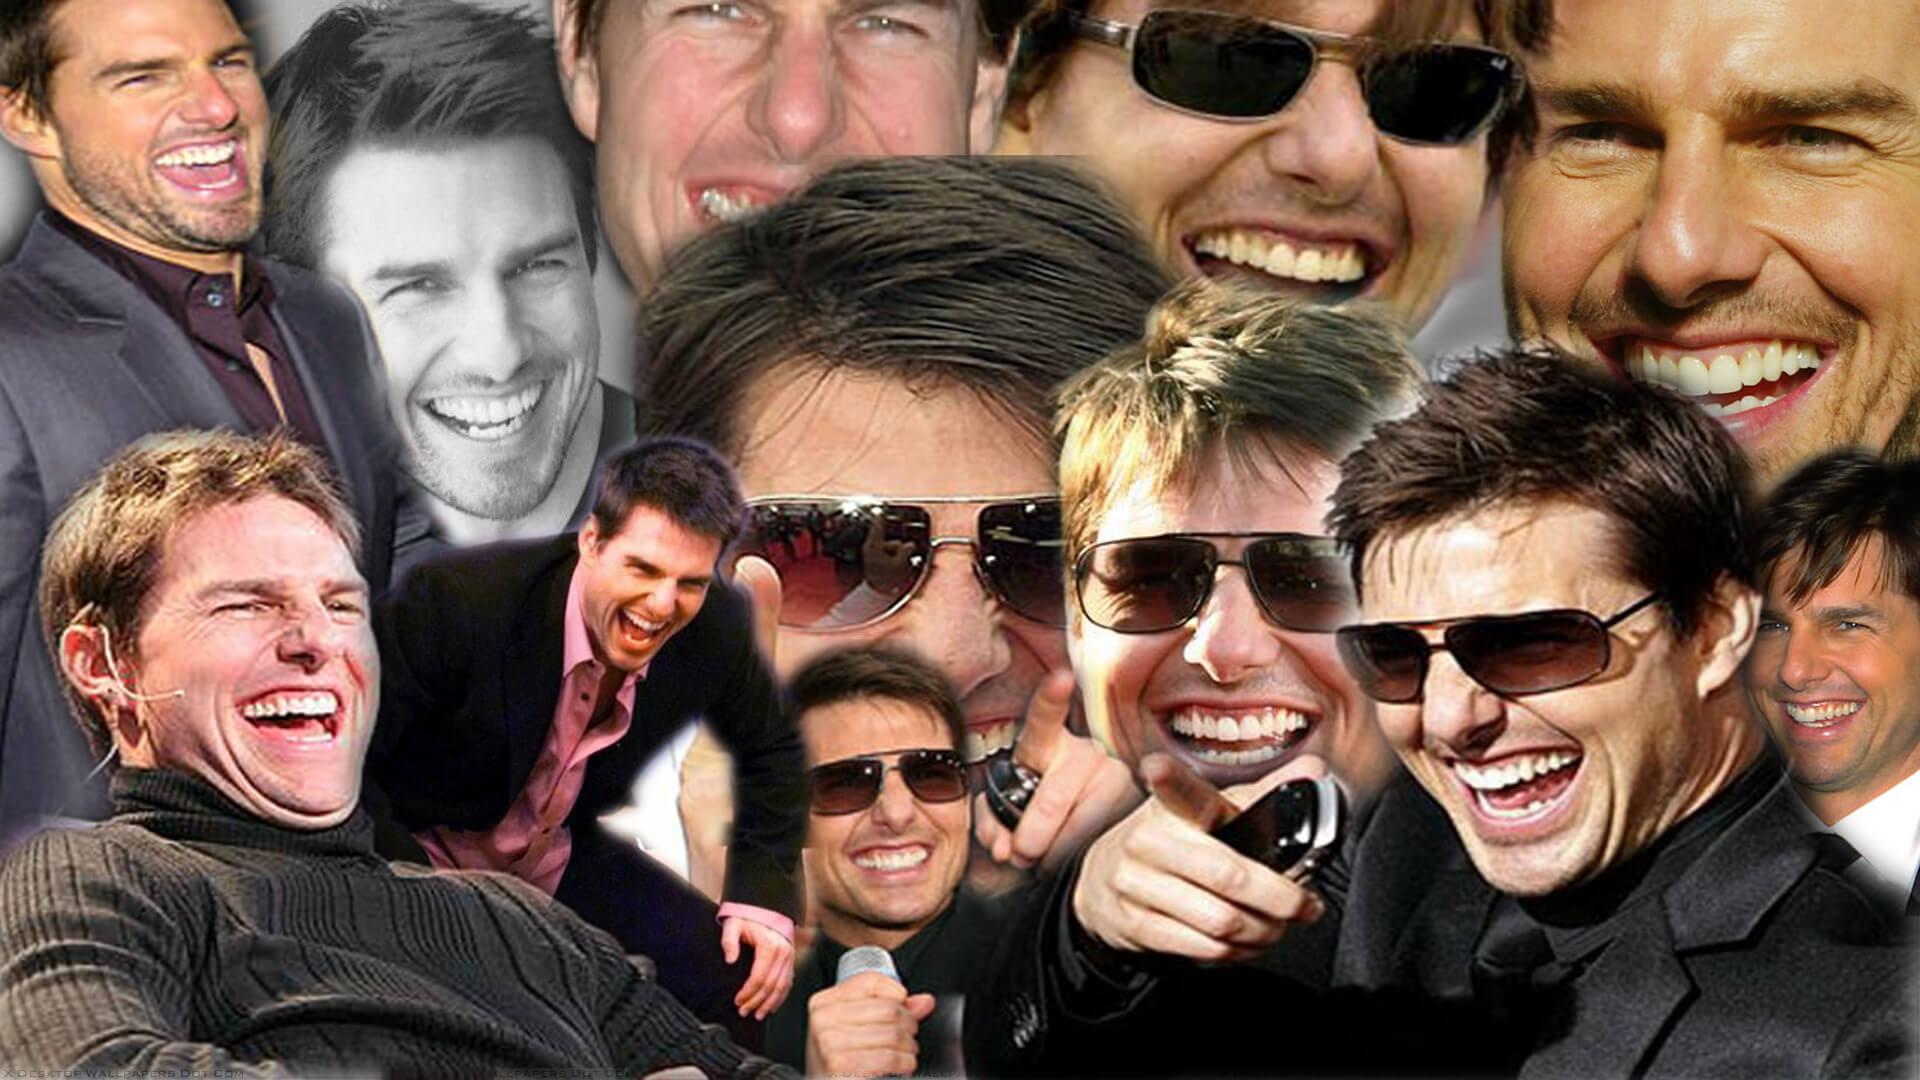 Tom Cruise April Fool's 2016